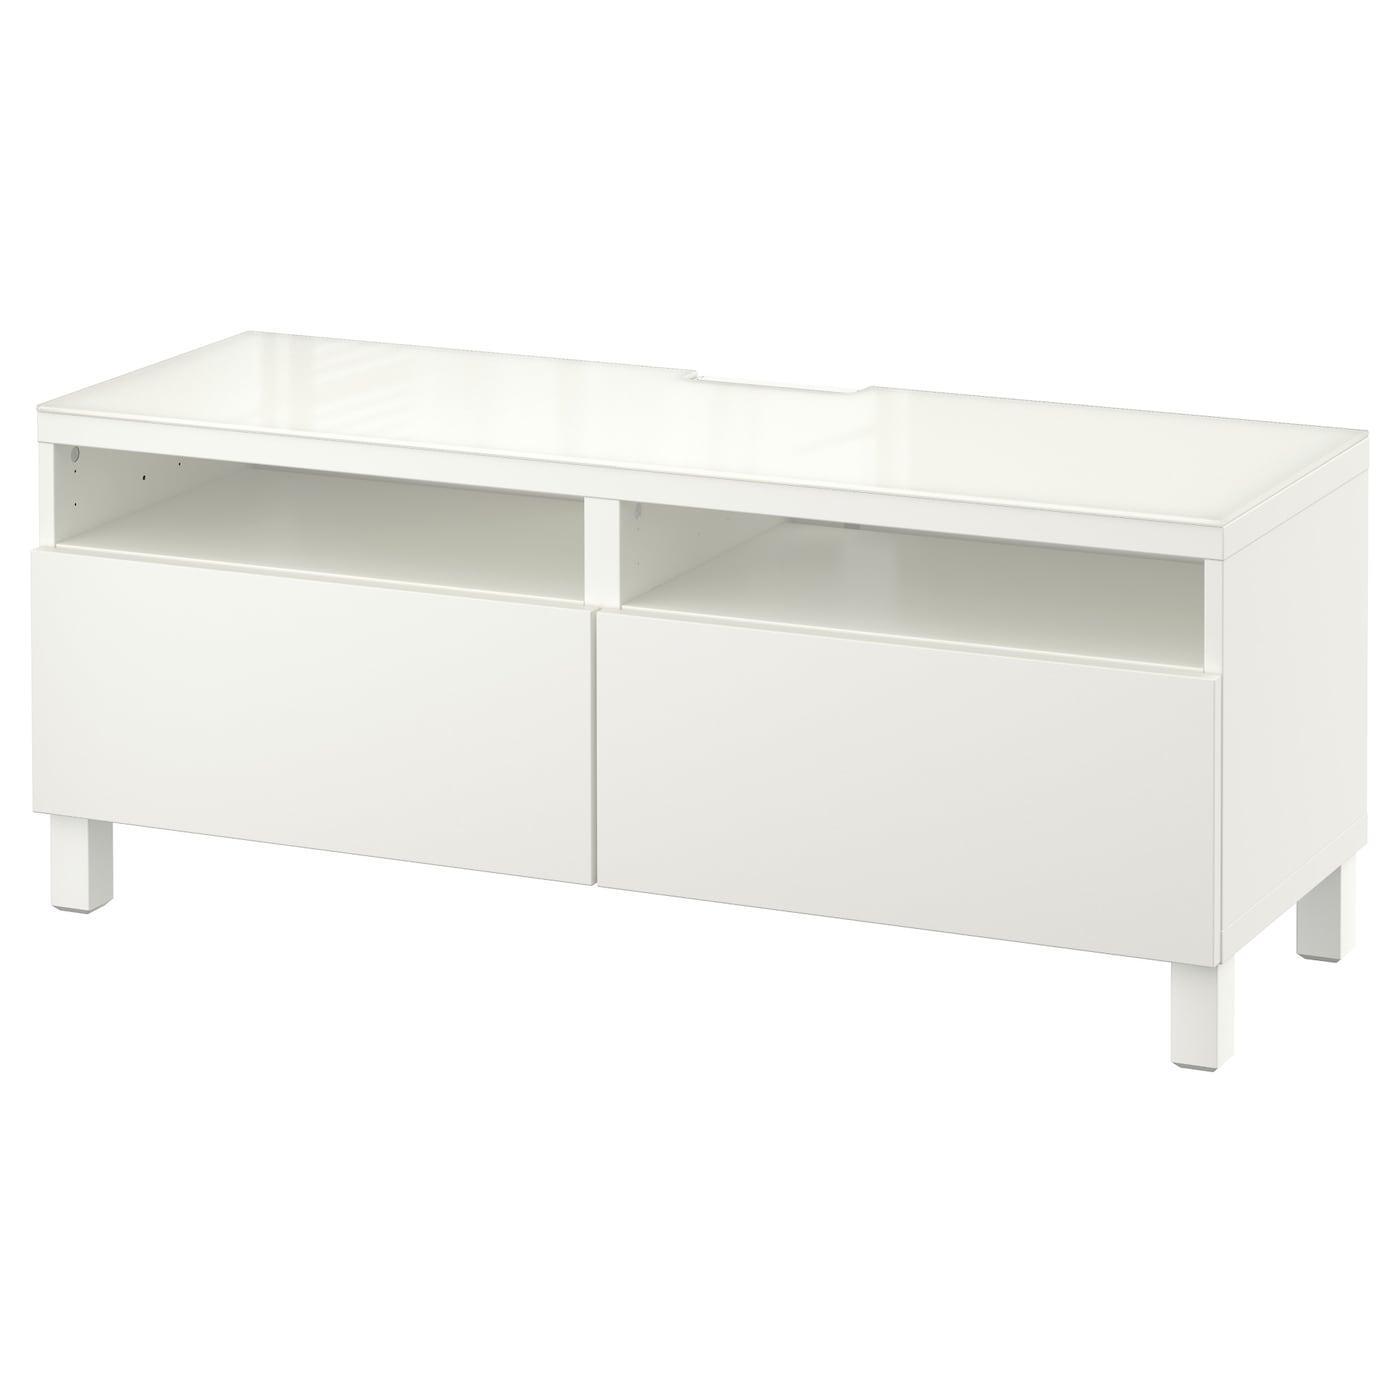 Besta Banc Tv Avec Tiroirs Lappviken Blanc 120 X 40 X 48 Cm Ikea